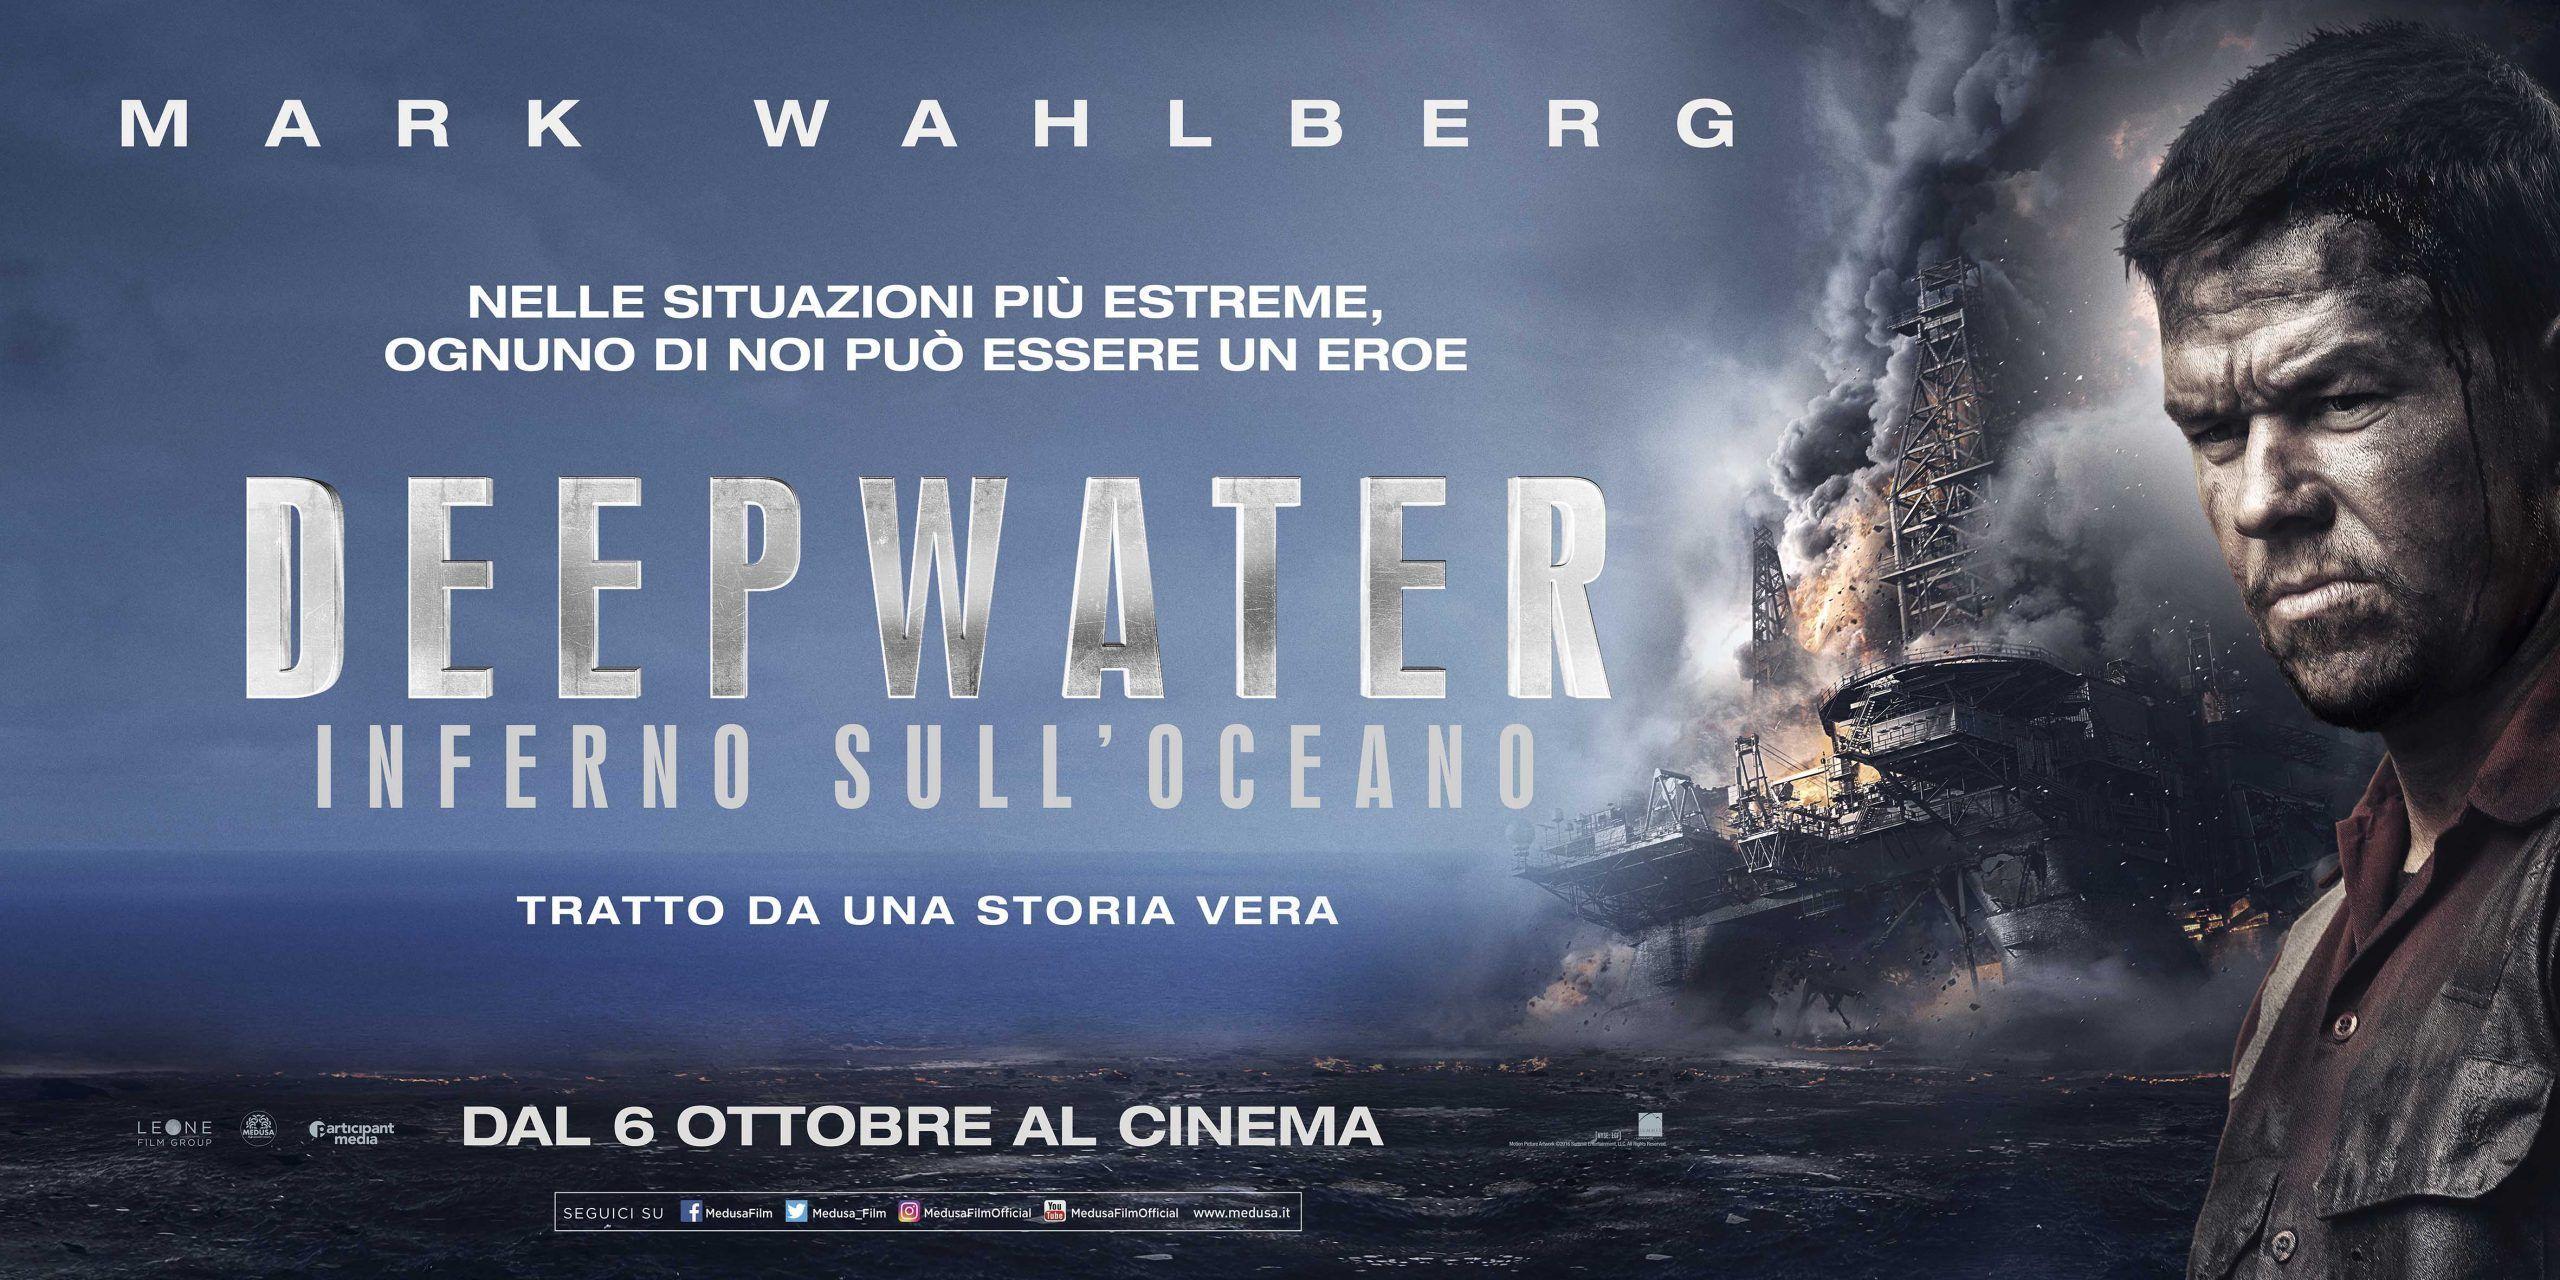 DeepWater Inferno sull'oceano locandina